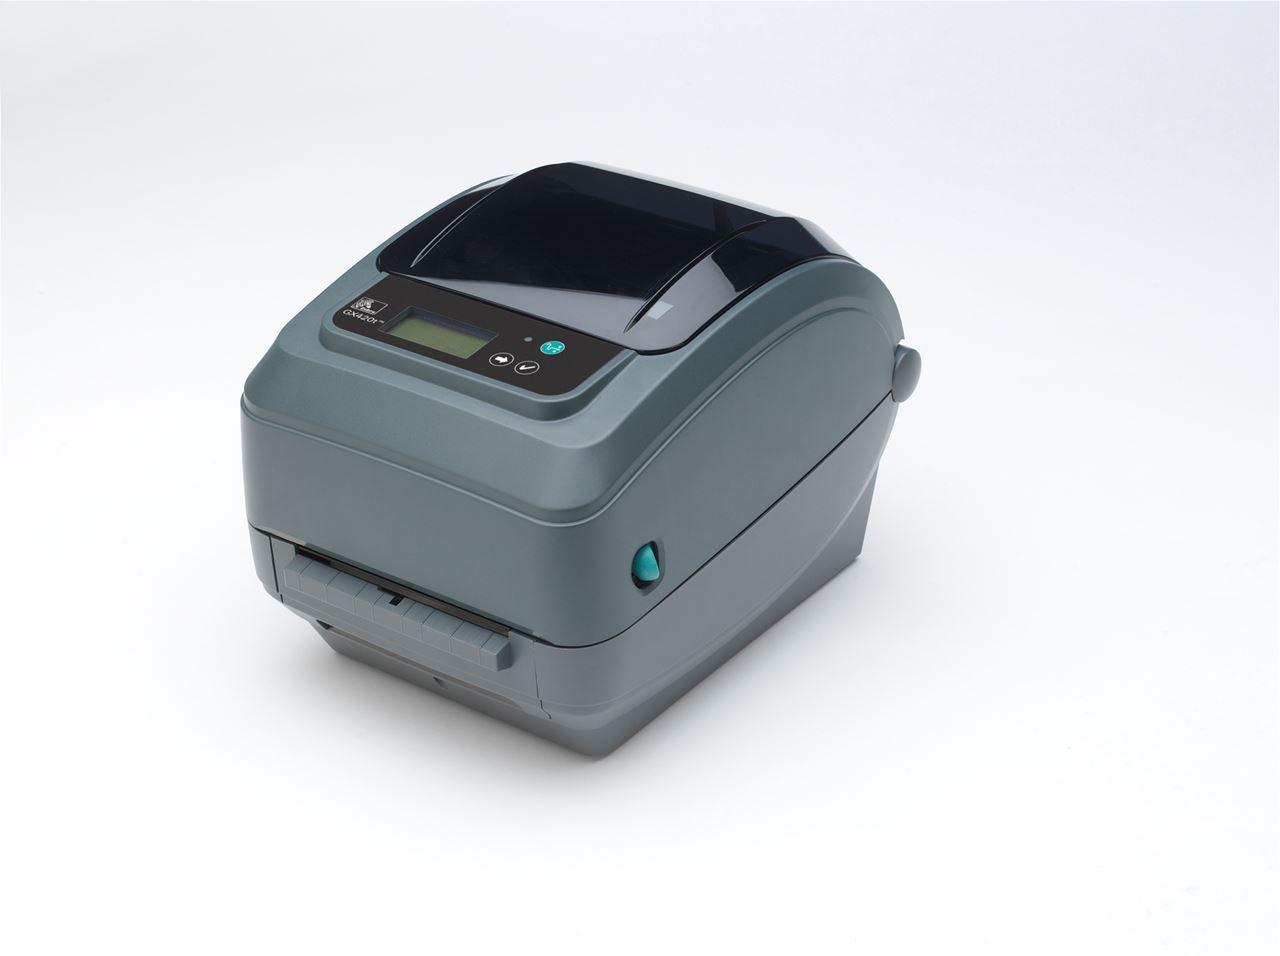 Picture of Zebra GX420d Desktop Printer Range